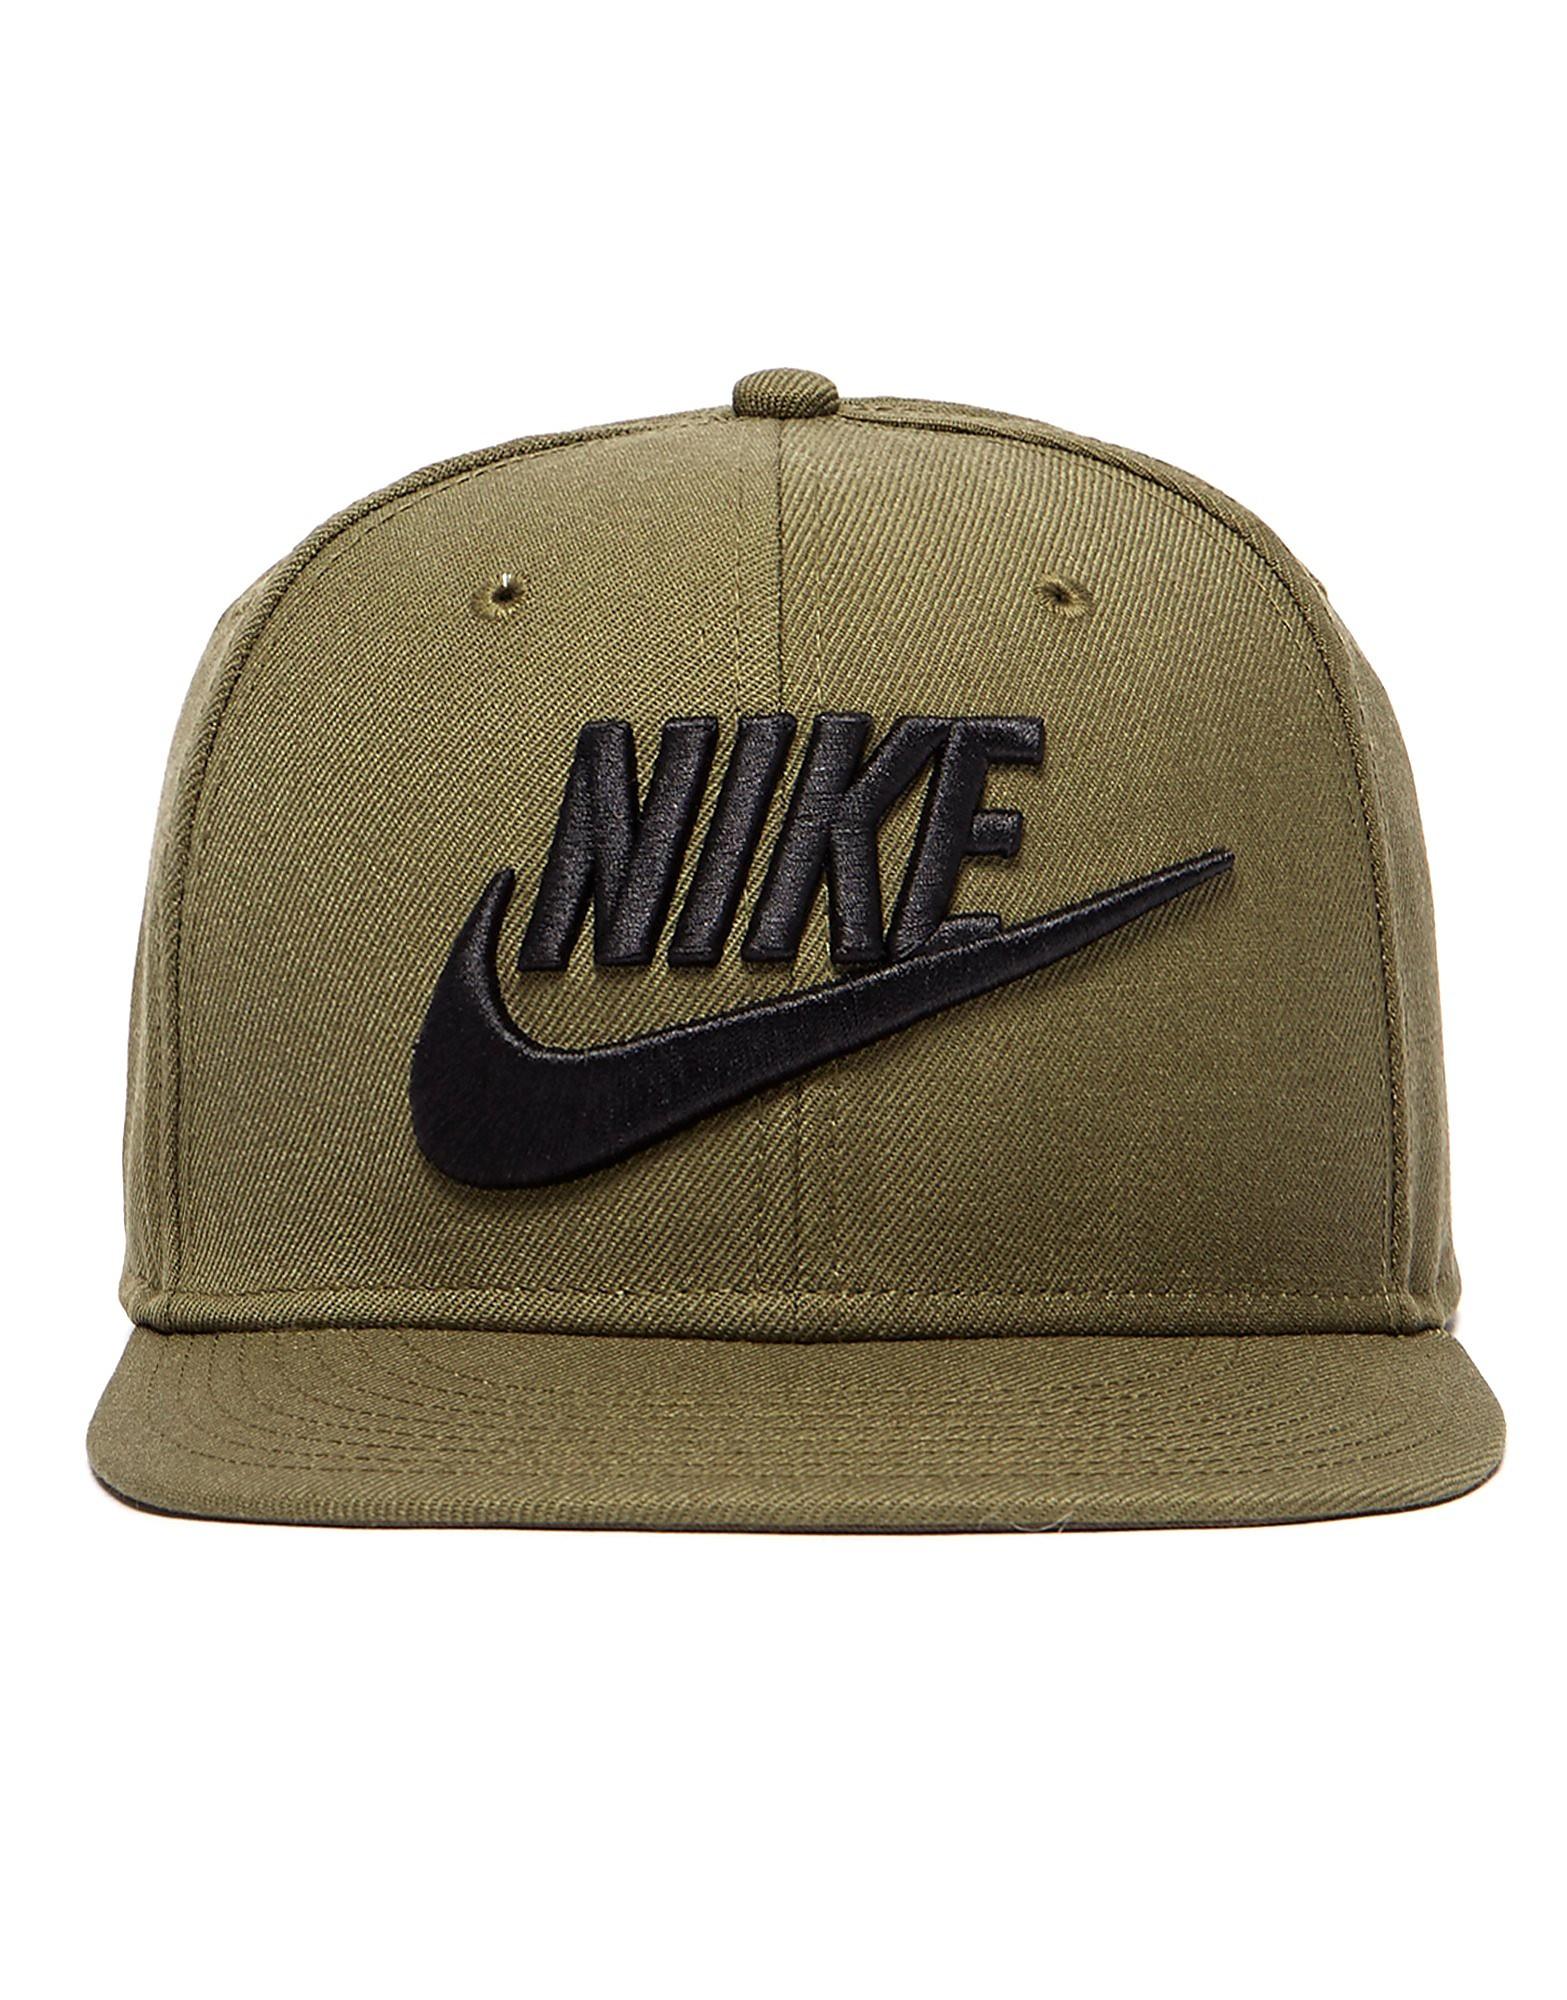 Nike Futura True 2 Snapback Cap Olive Black